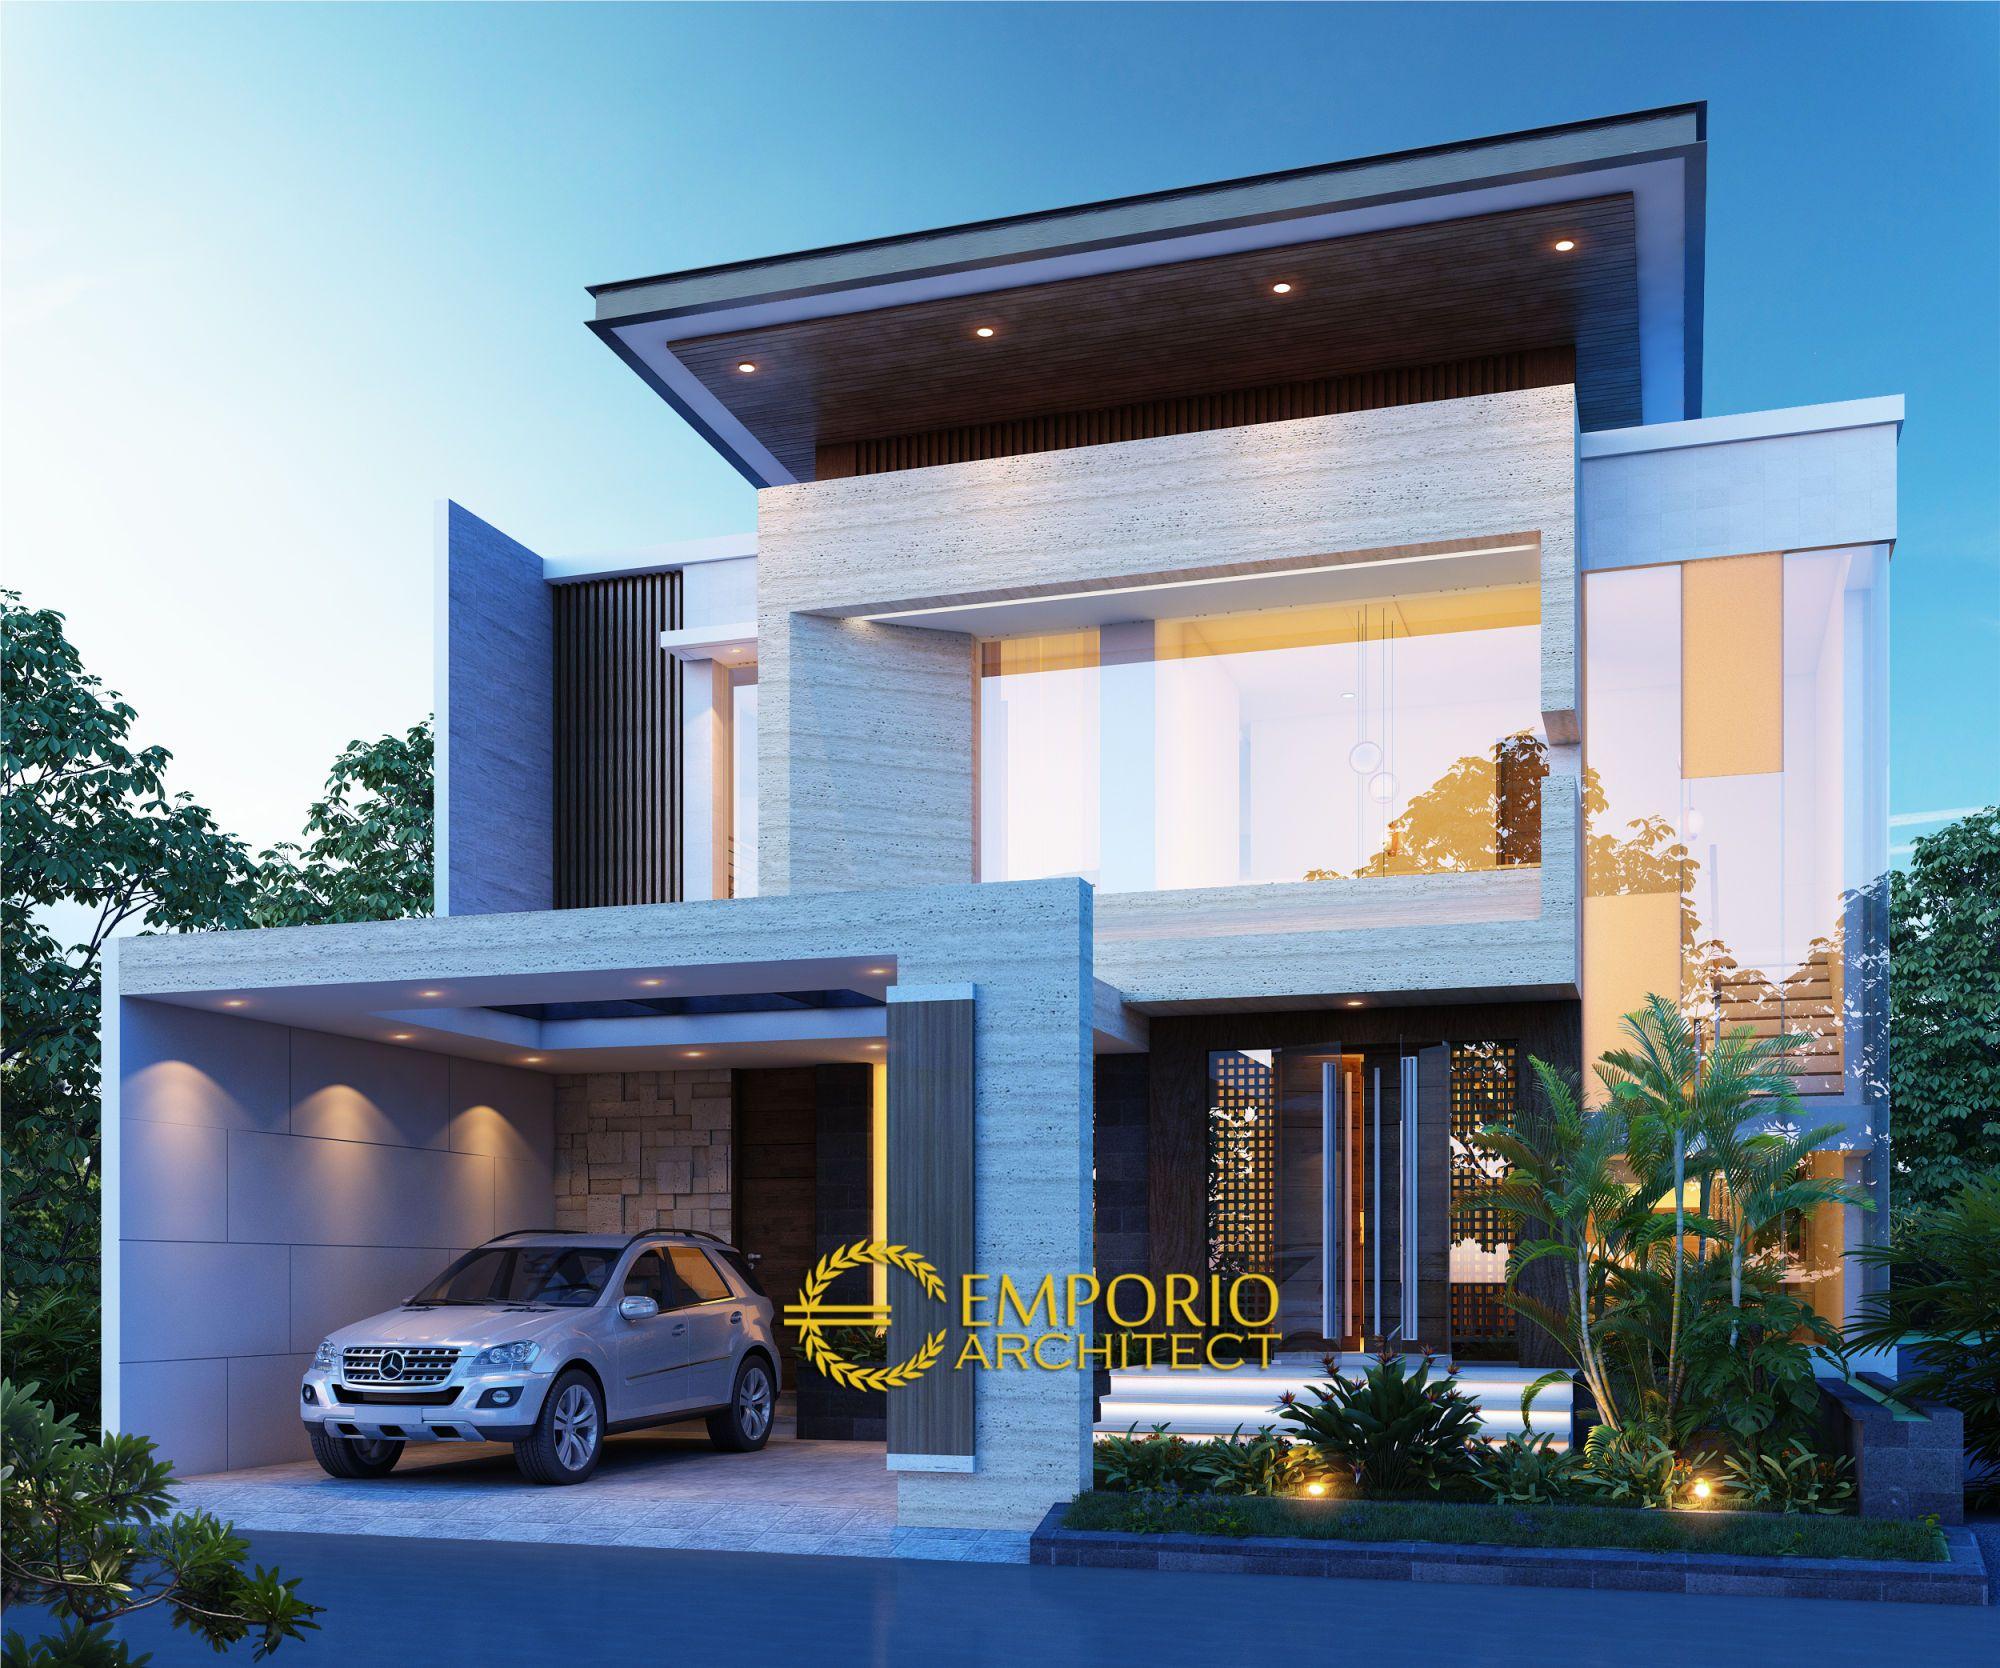 Jasa Arsitek Solo Surakarta Jawa Tengah Desain Rumah Bapak